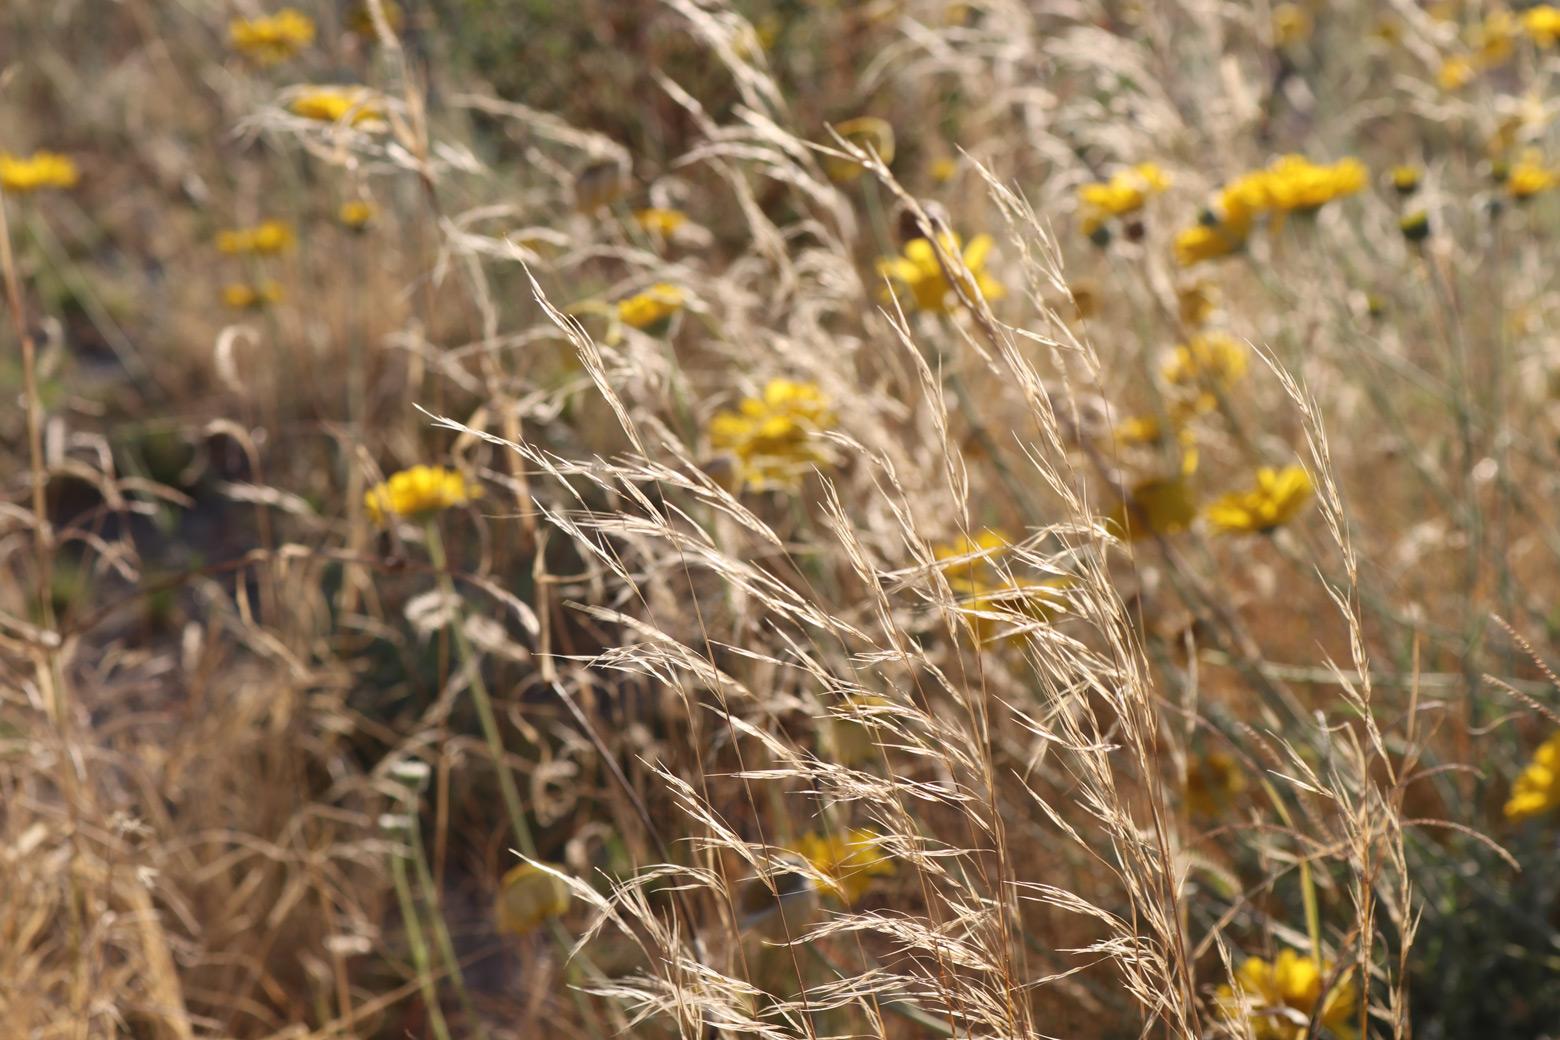 A close of of Indian Ricegrass among Desert Marigold flowers.